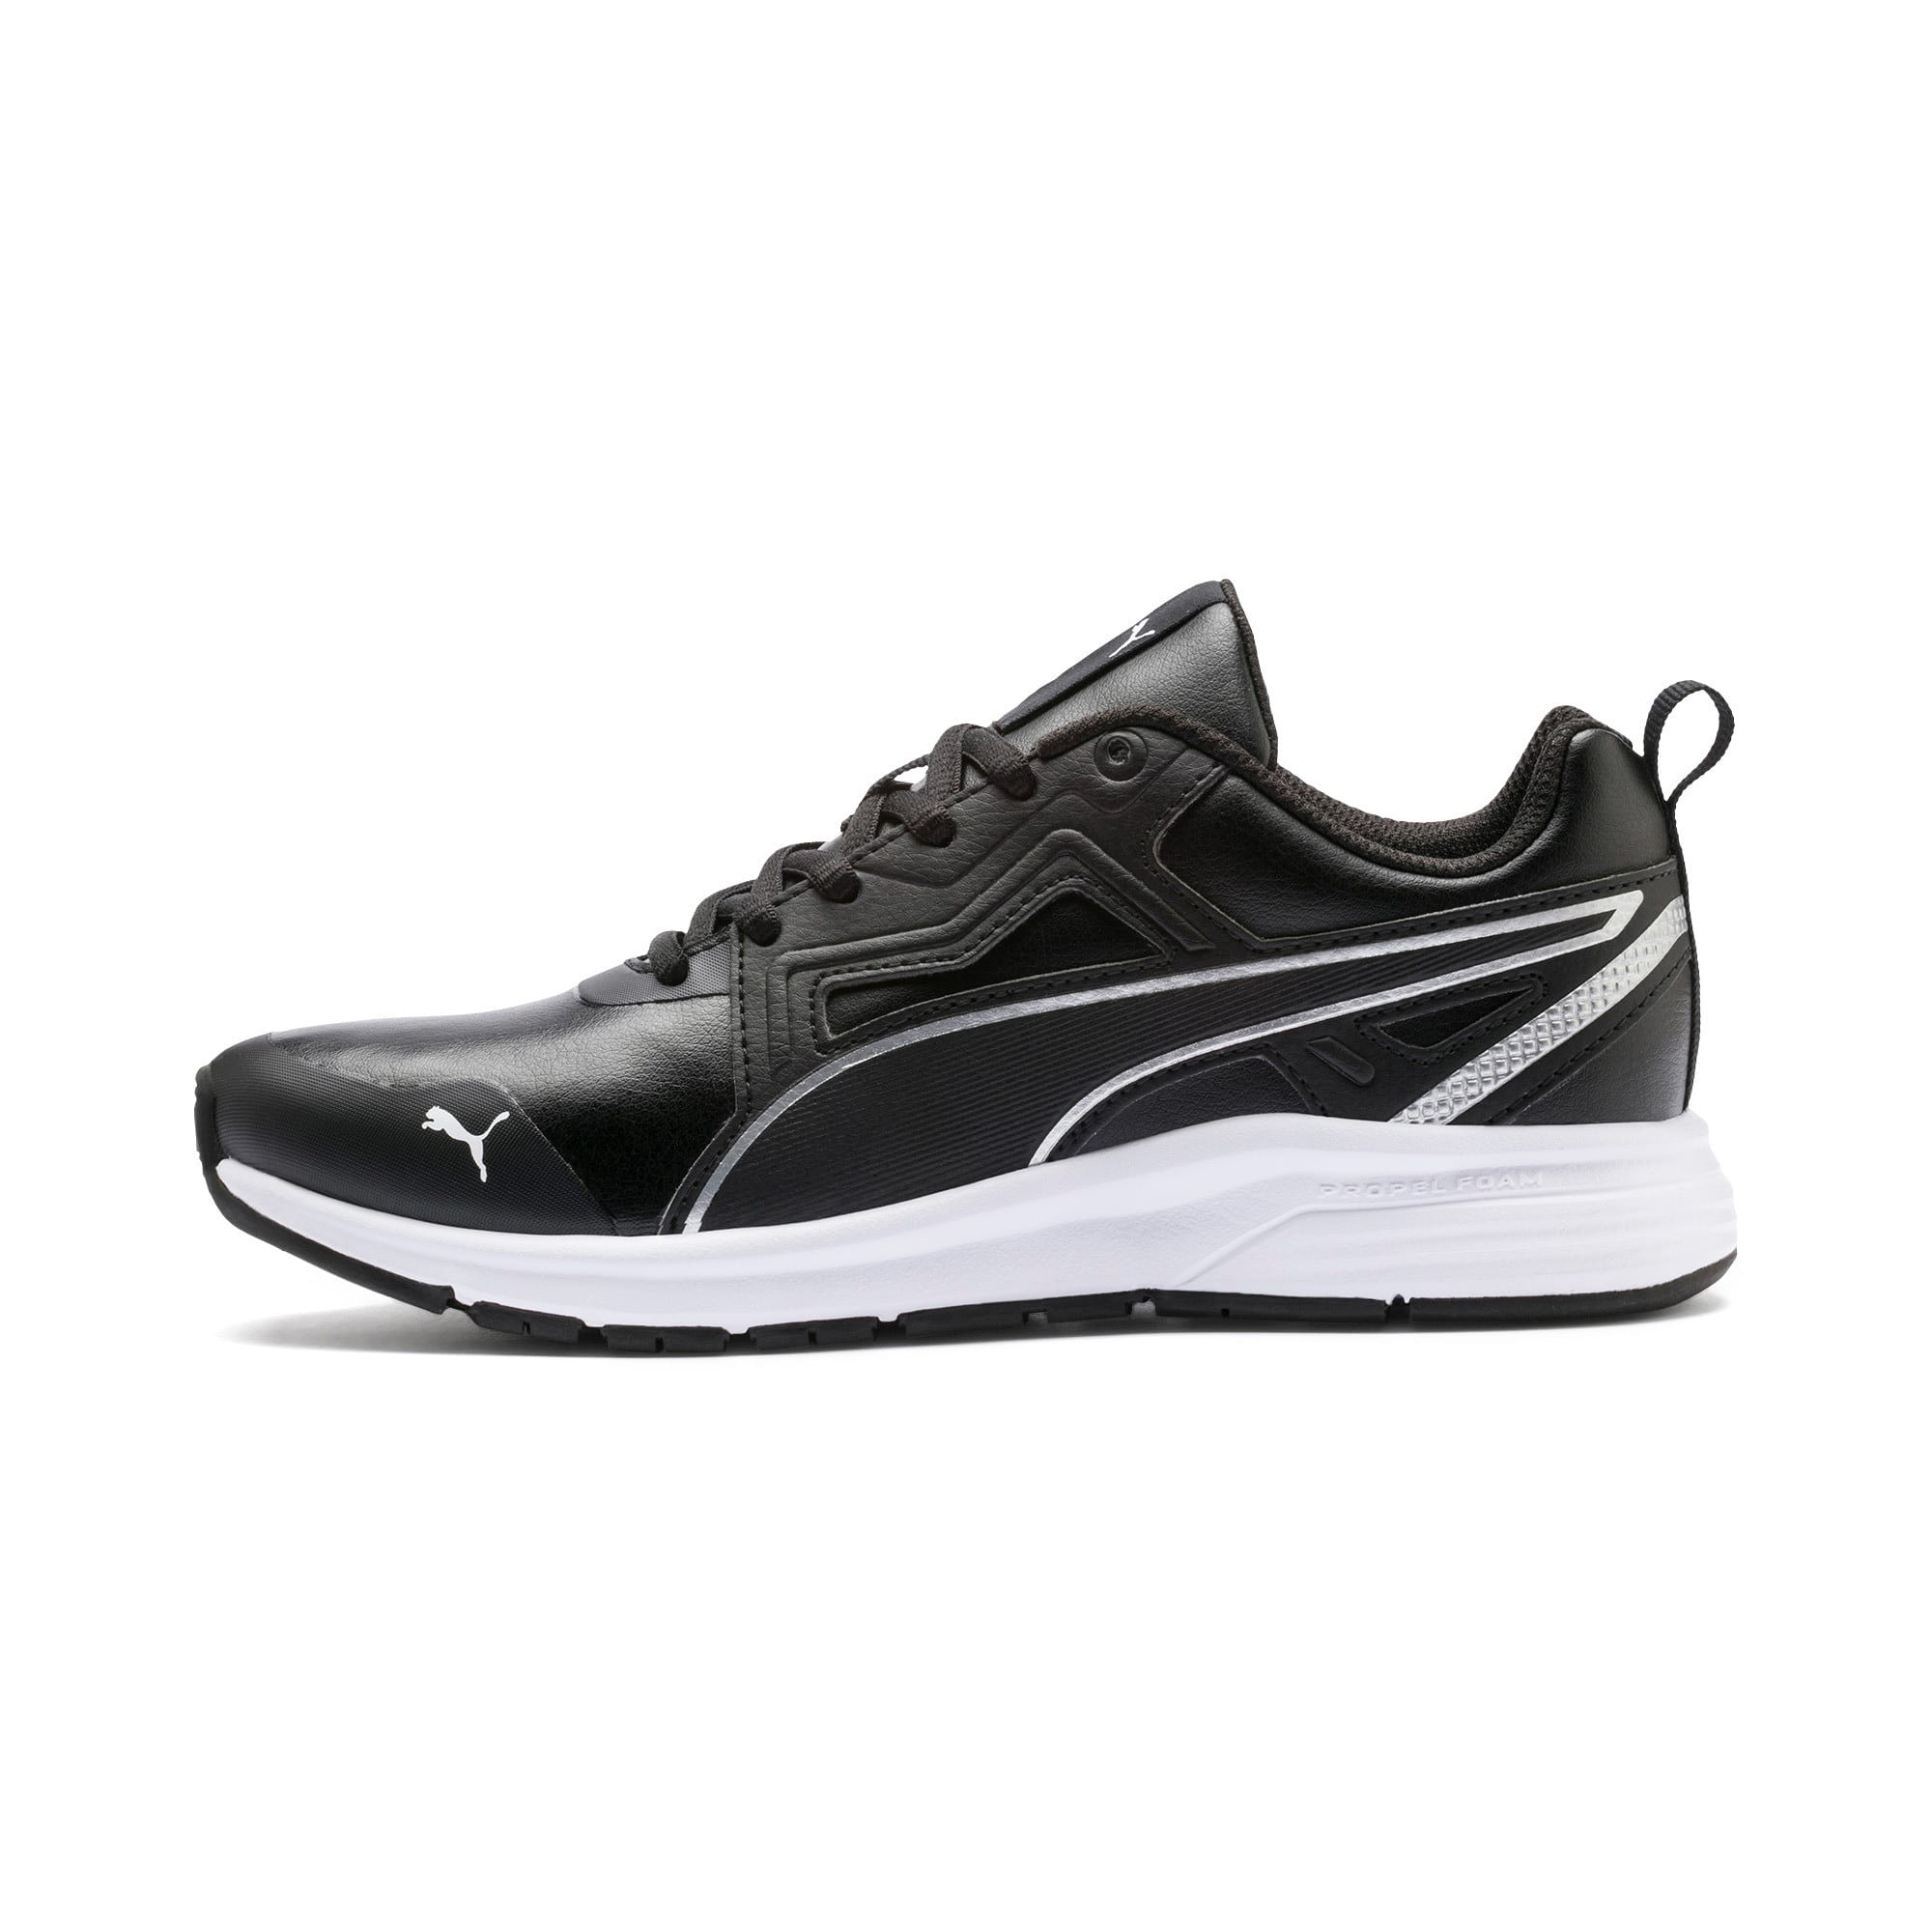 Thumbnail 1 of Pure Jogger SL Sneakers JR, Puma Black-Puma Silver-White, medium